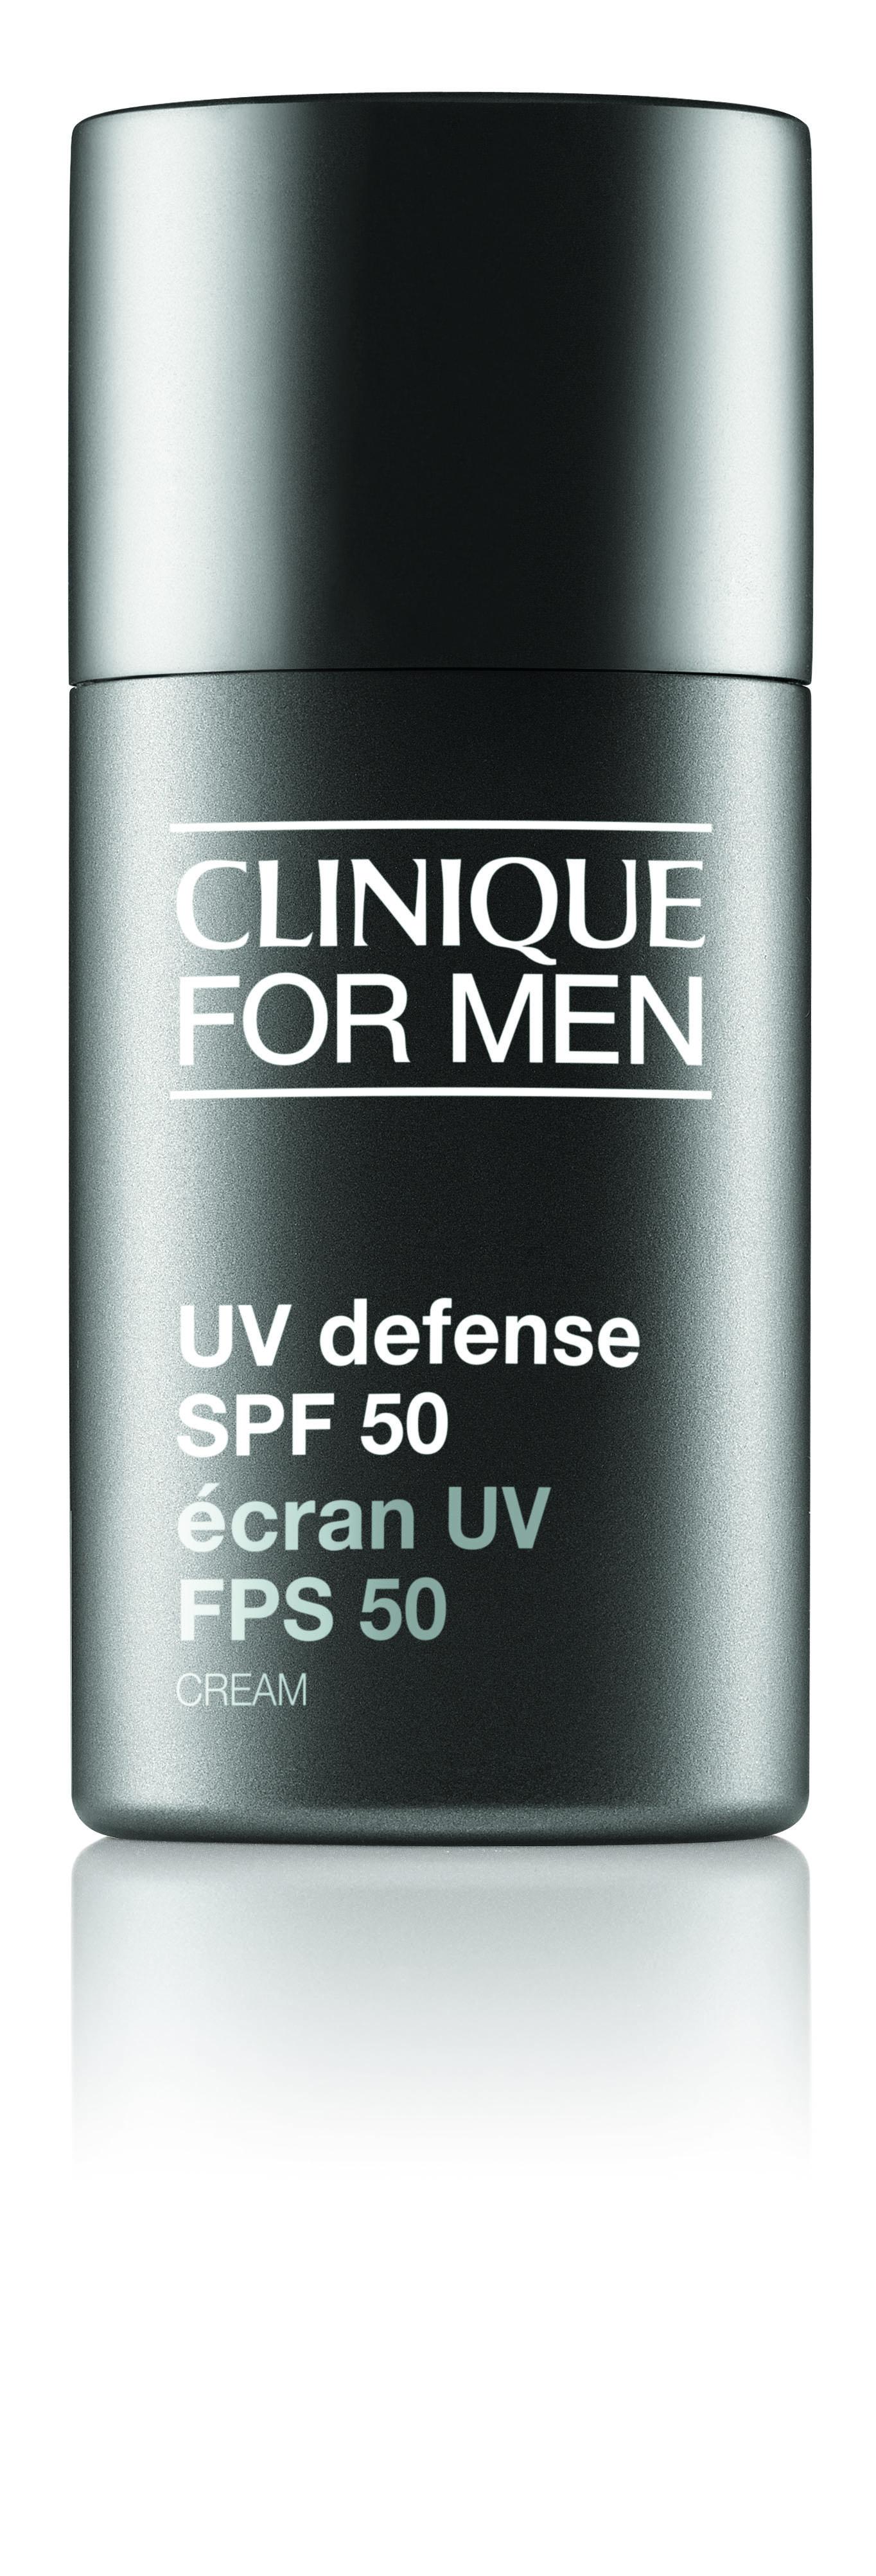 Clinique_Men UV Defense_Image